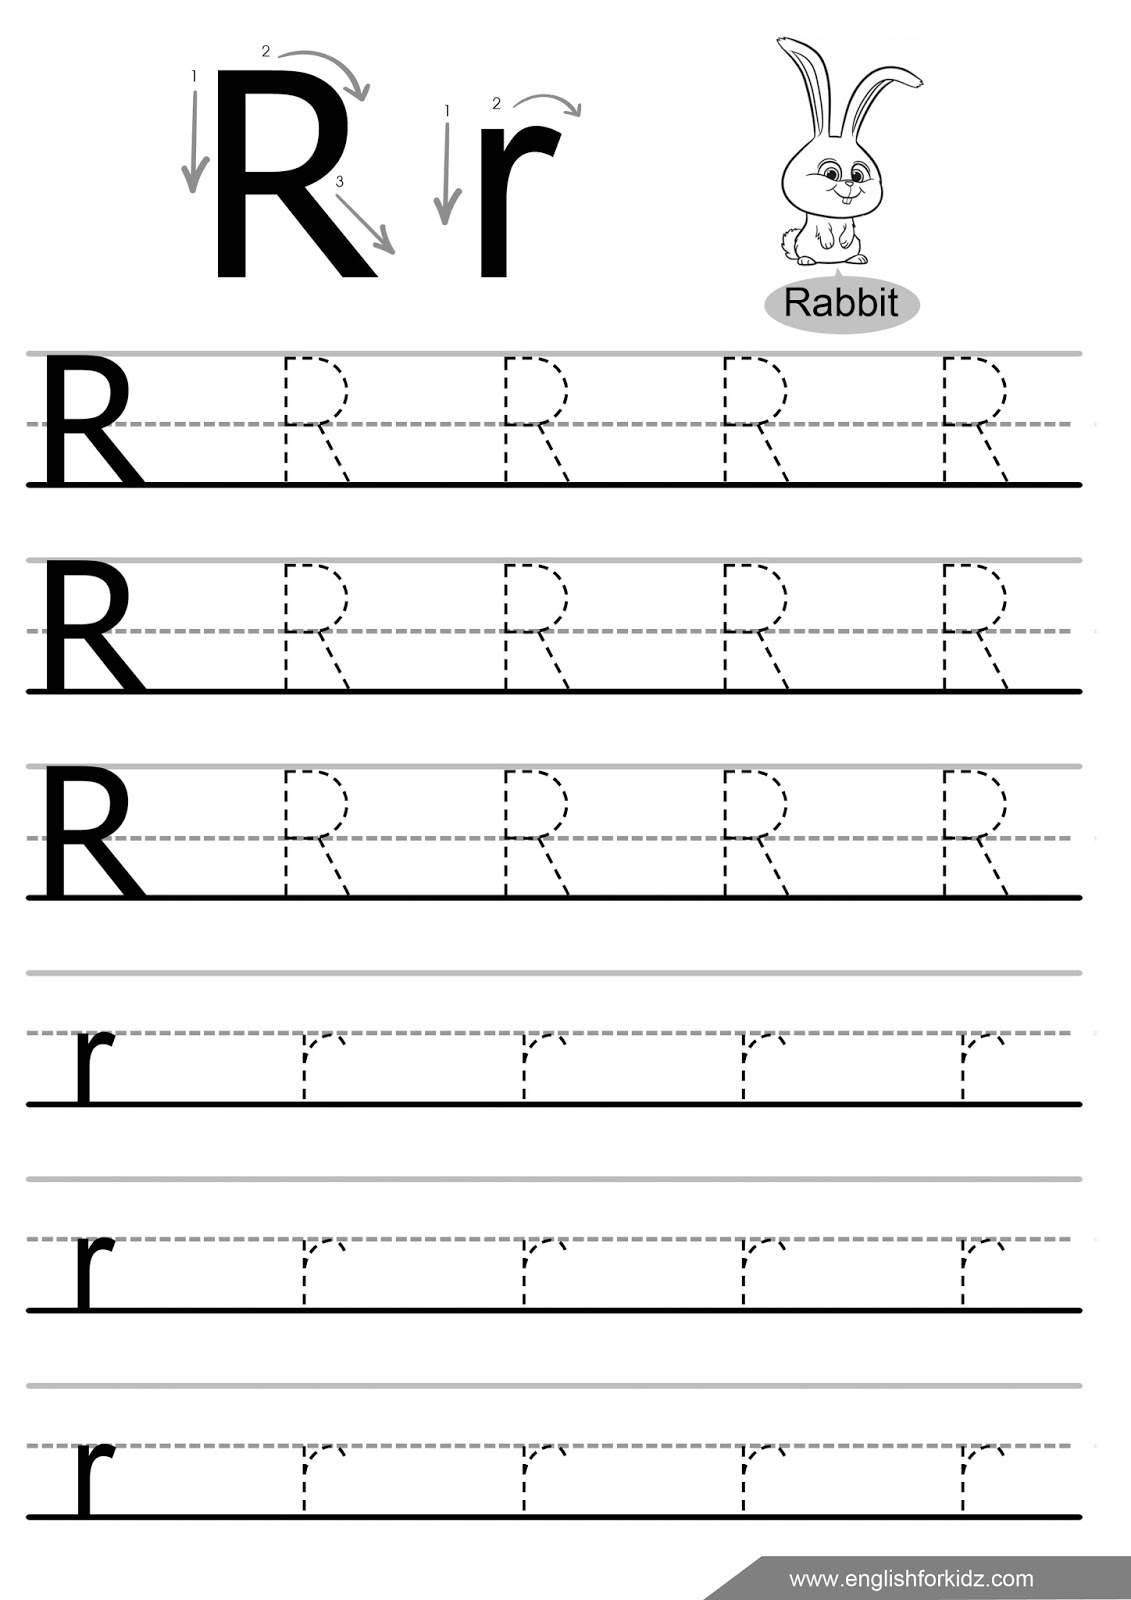 Letter Tracing Worksheets (Letters K - T) regarding Letter A Tracing Worksheets Pdf